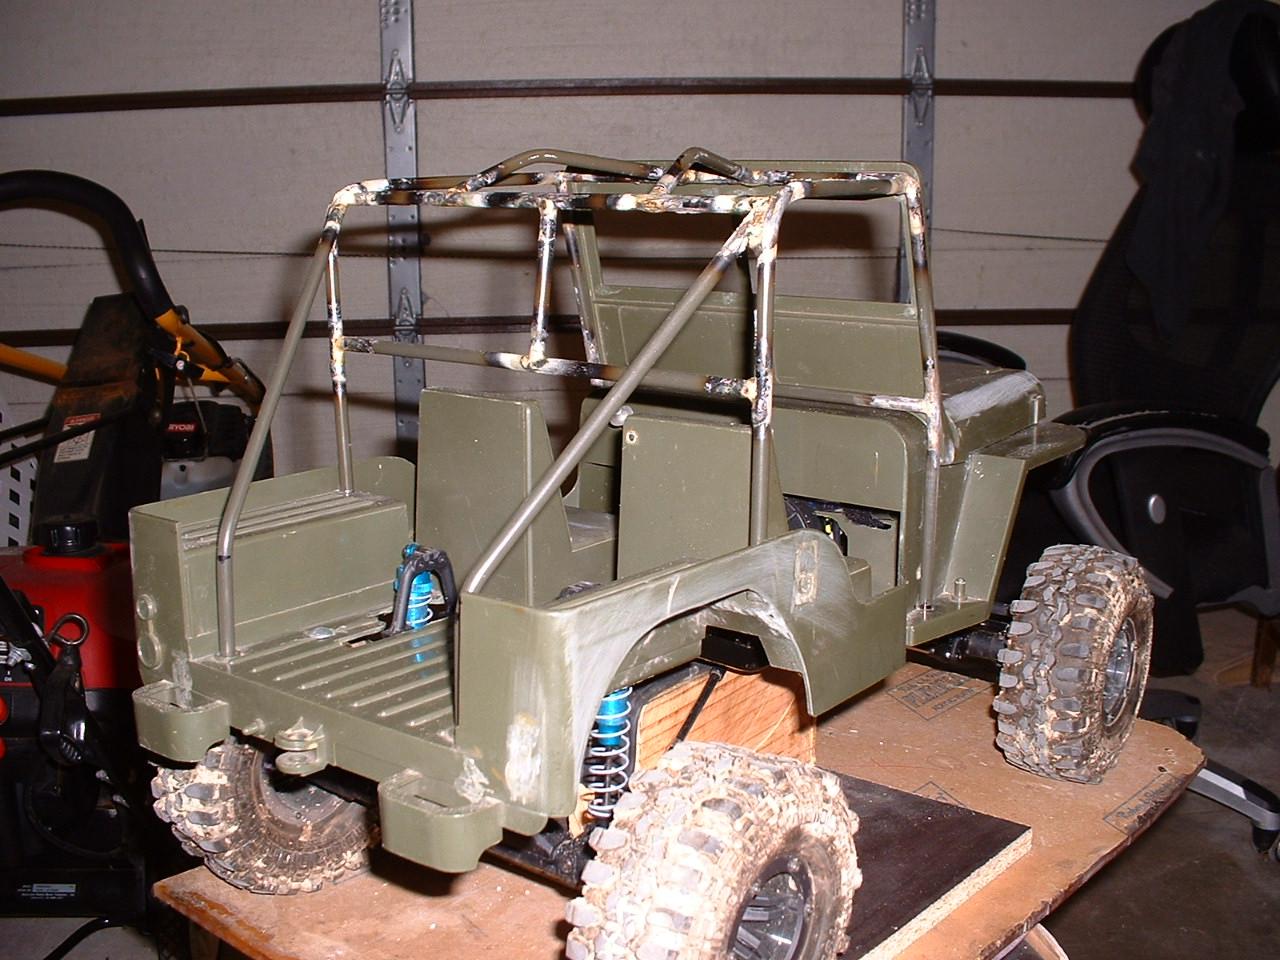 Click image for larger version.  Name:GI Joe Jeep 5b 001.JPG Views:233 Size:329.3 KB ID:2040907